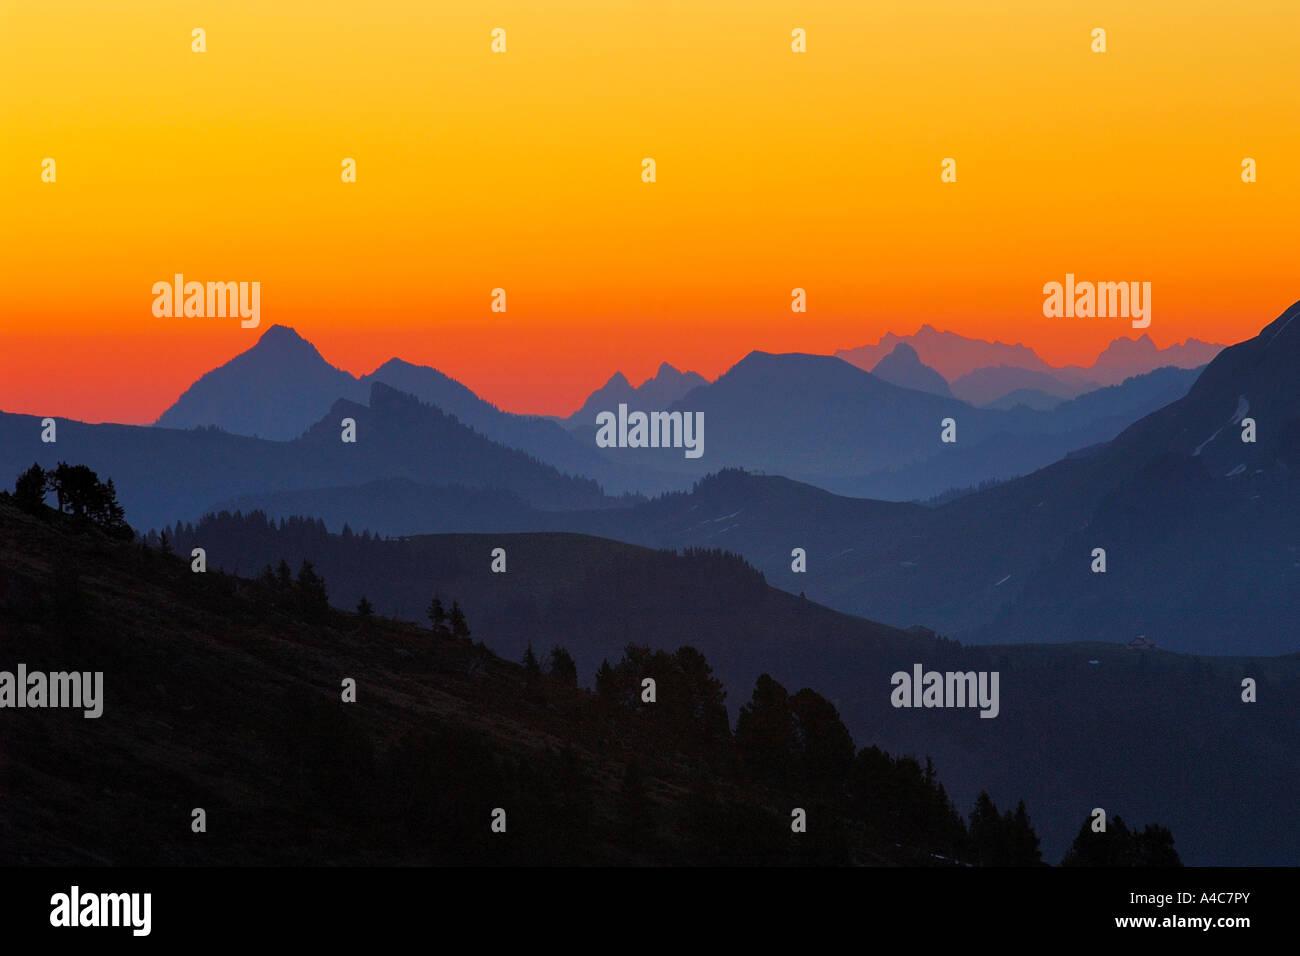 Amanecer en los Alpes. Suiza, Berna Oberland bernés Imagen De Stock